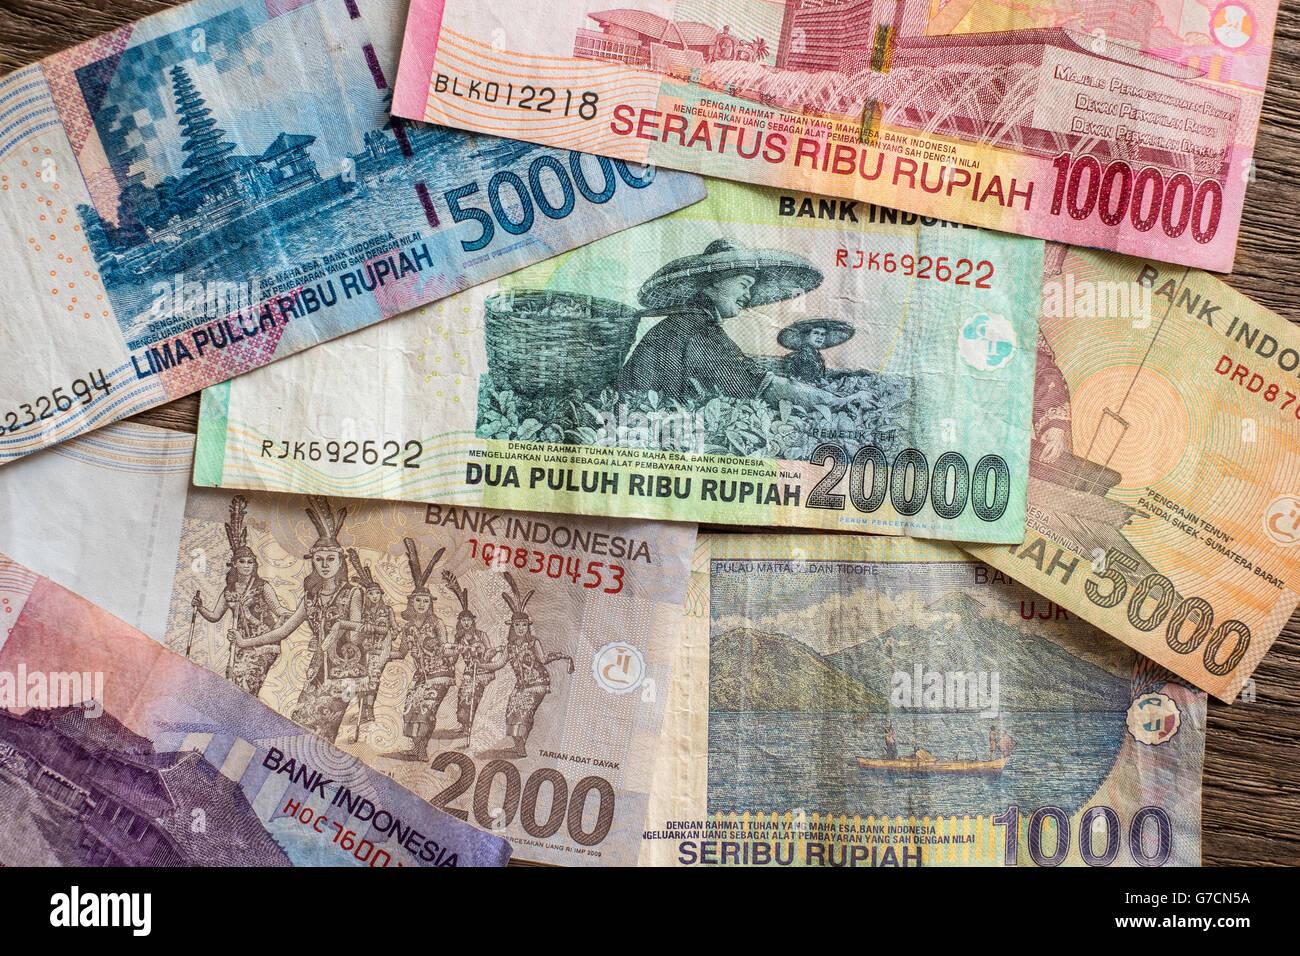 Indonesian Rupiah Note Stock Photos & Indonesian Rupiah Note